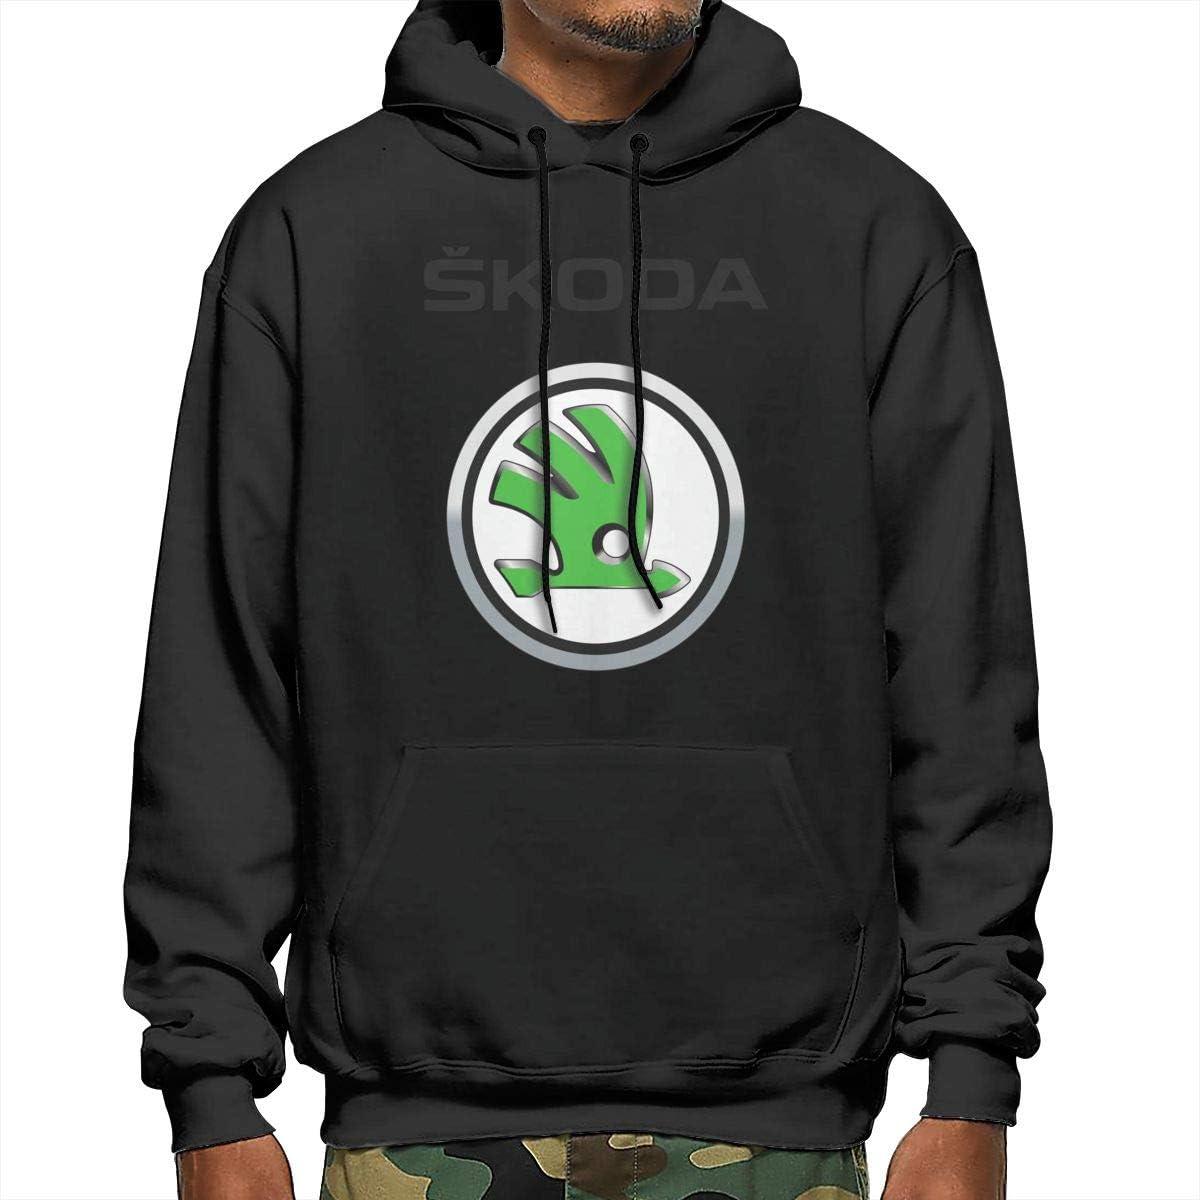 HRSHENG Boys Designed Skoda Motors Logo with Hood Cool Sweatshirt Black